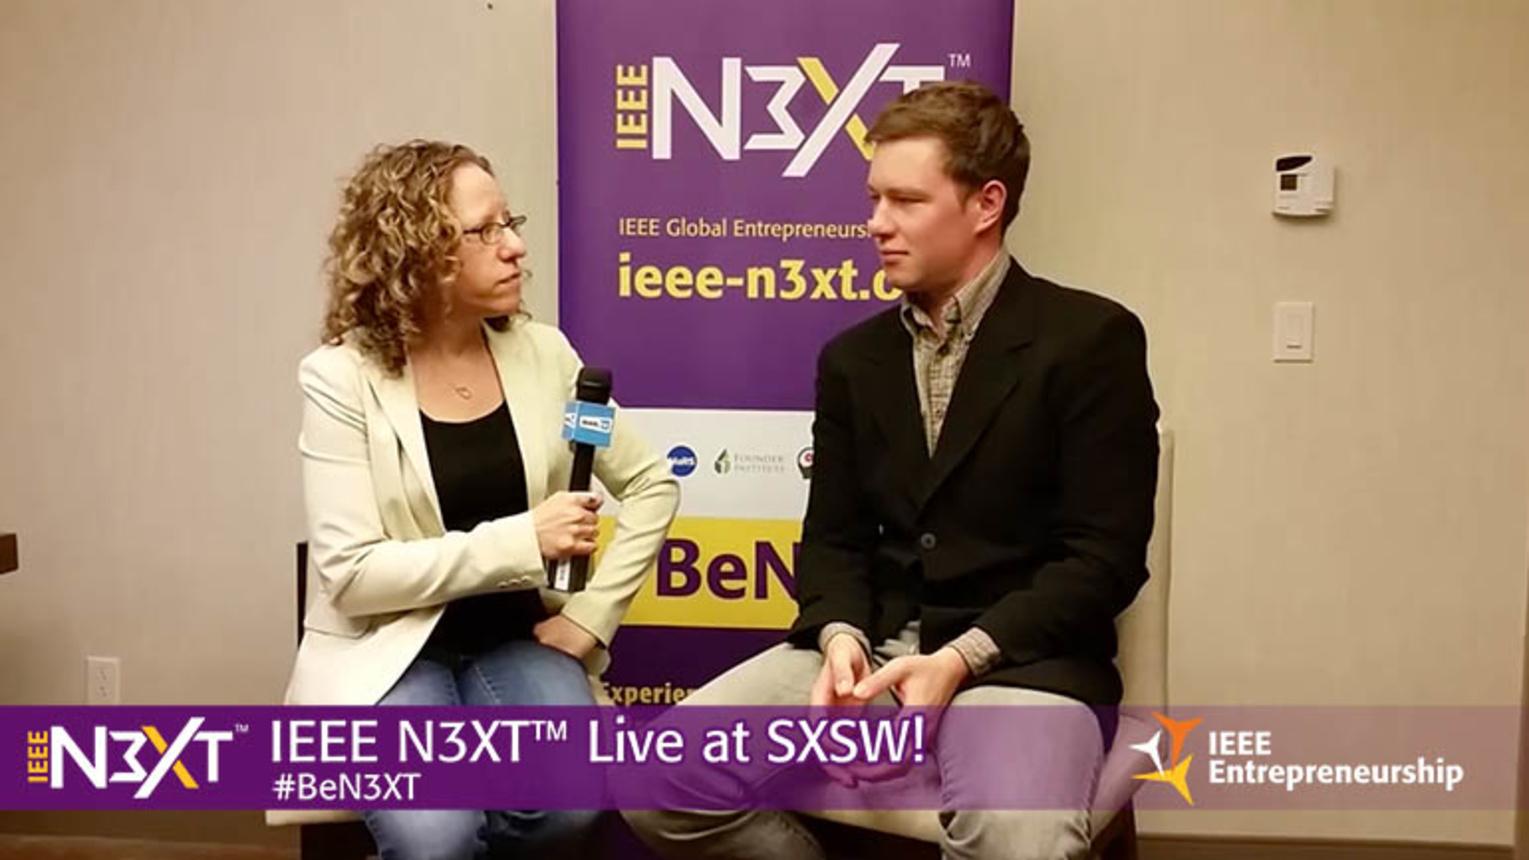 IEEE N3XT @ SXSW 2016: Andrew Krause, EECOSphere